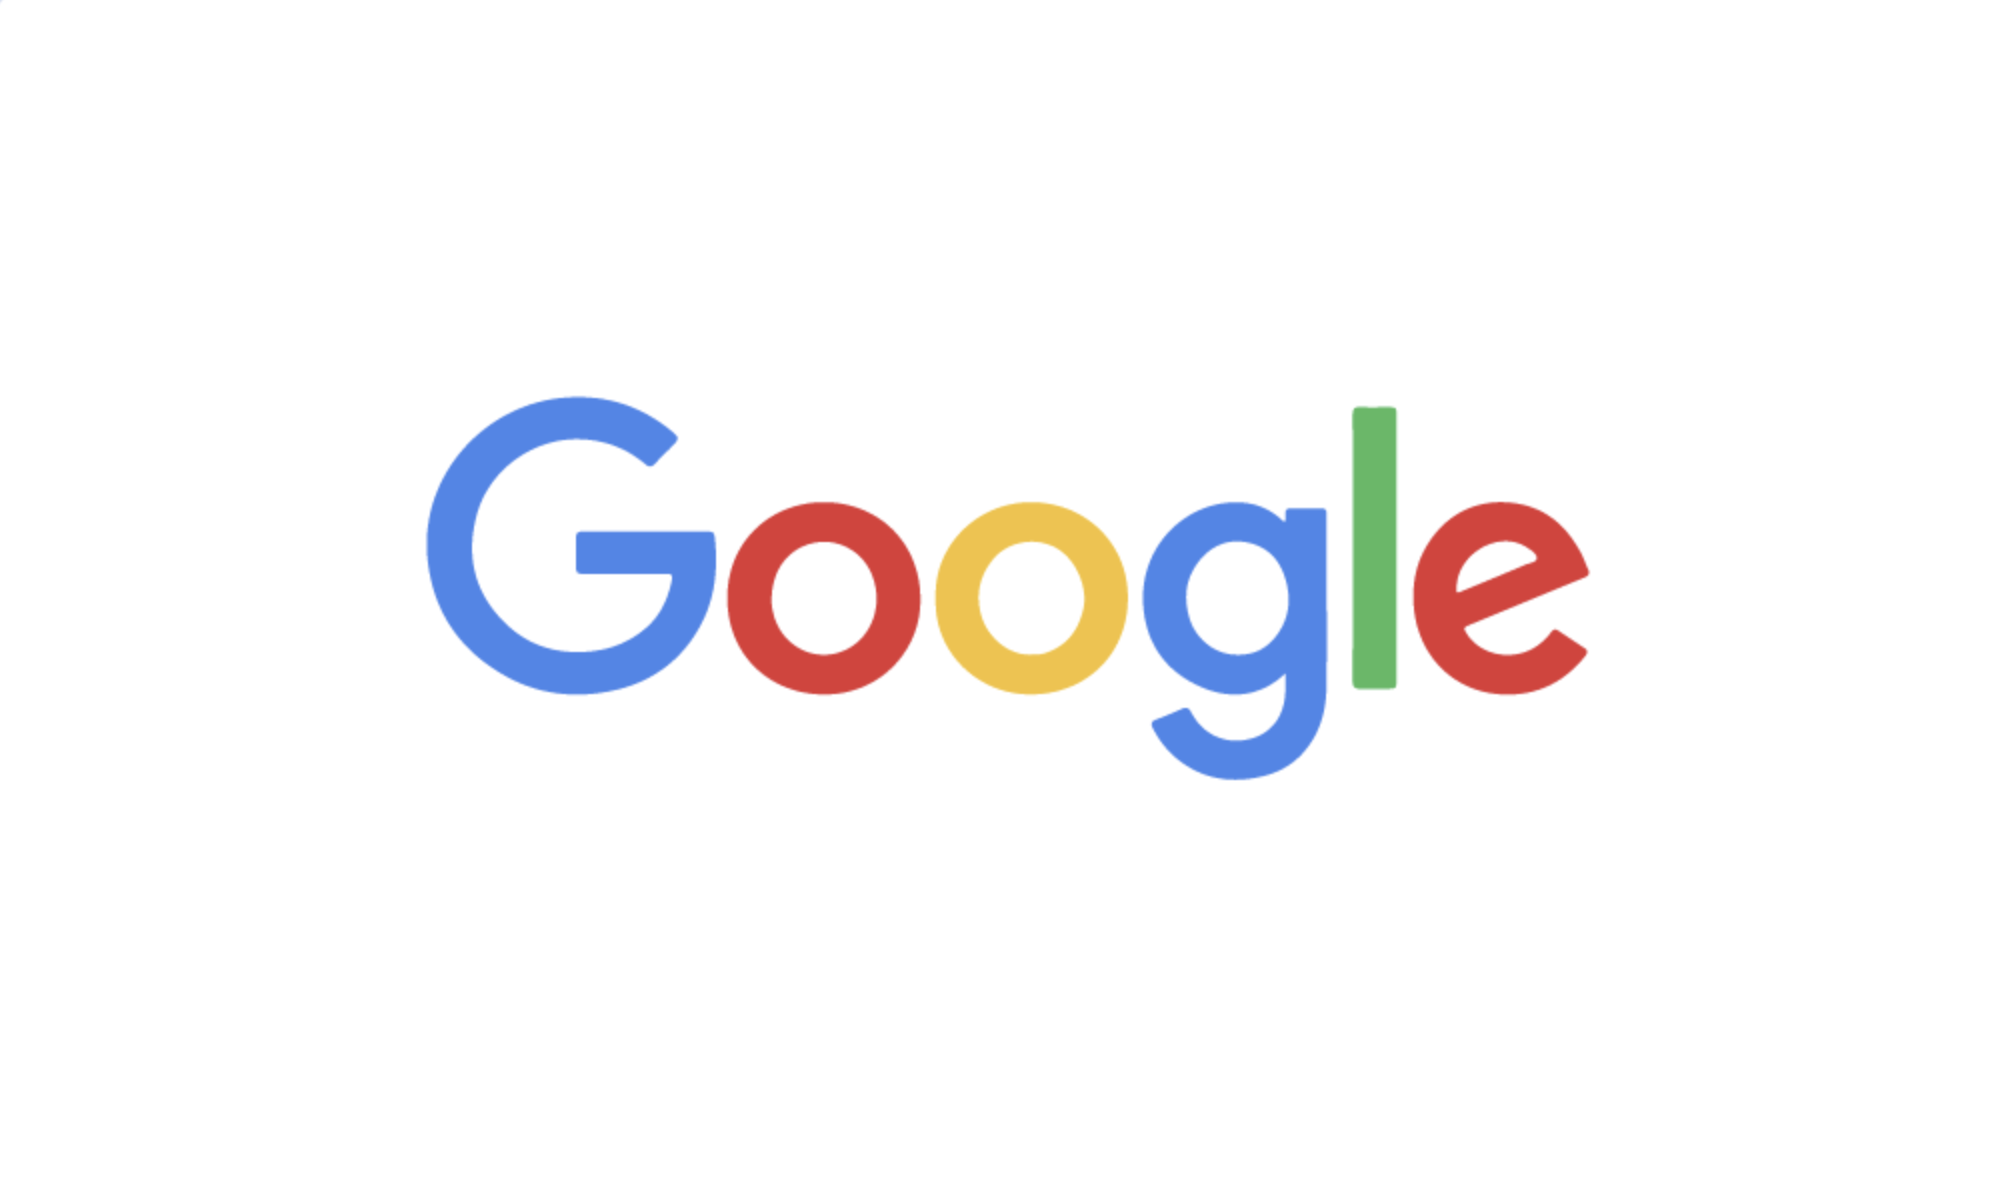 Recognizable Logo Design for Company